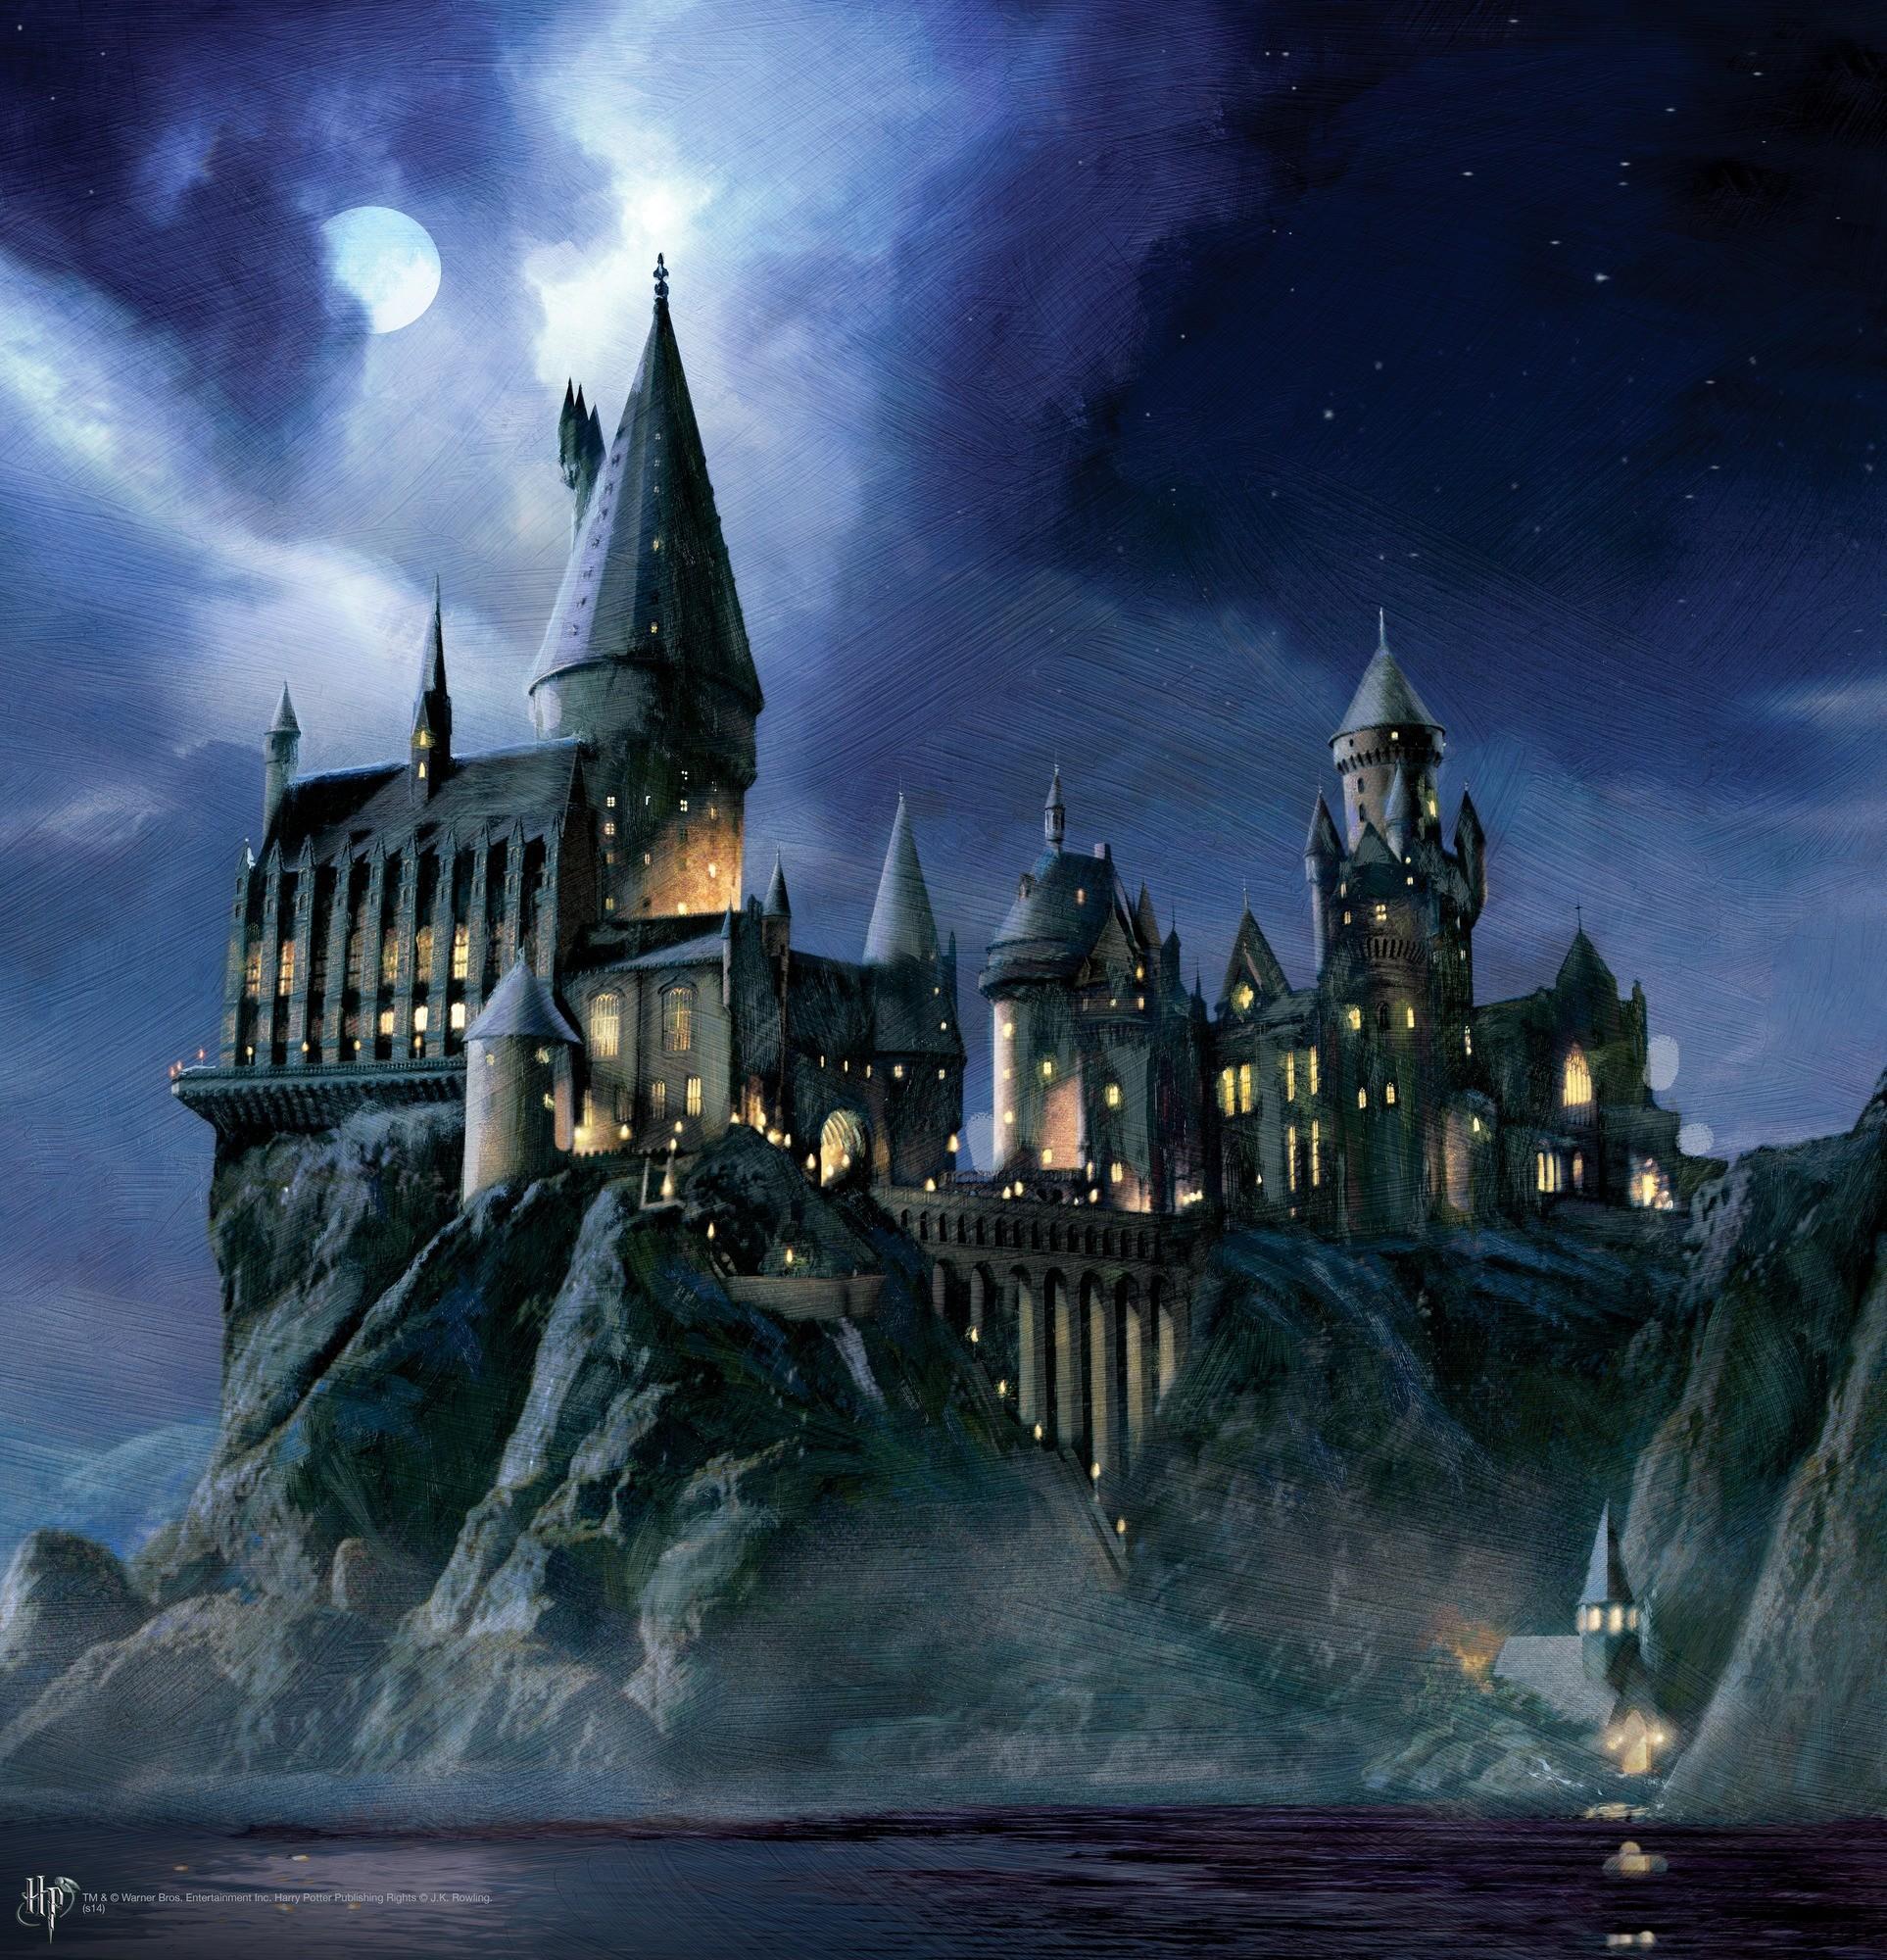 Harry Potter Iphone Wallpaper: Harry Potter Book Wallpaper (71+ Immagini